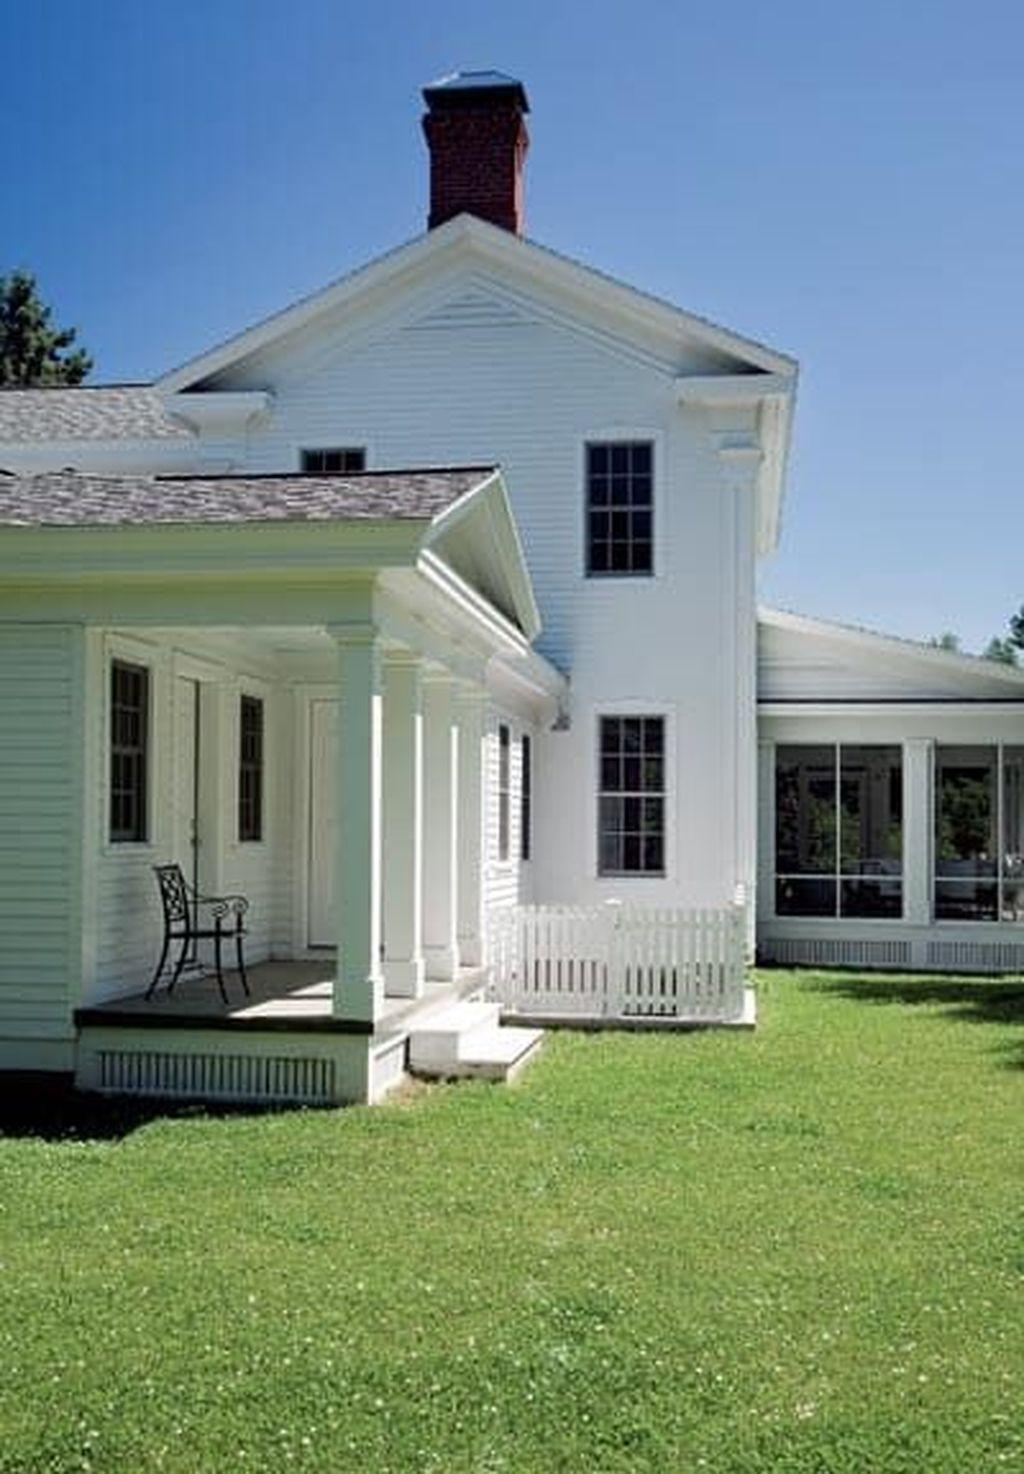 Captivating Farmhouse Exterior House Design Ideas To Copy Right Now 02